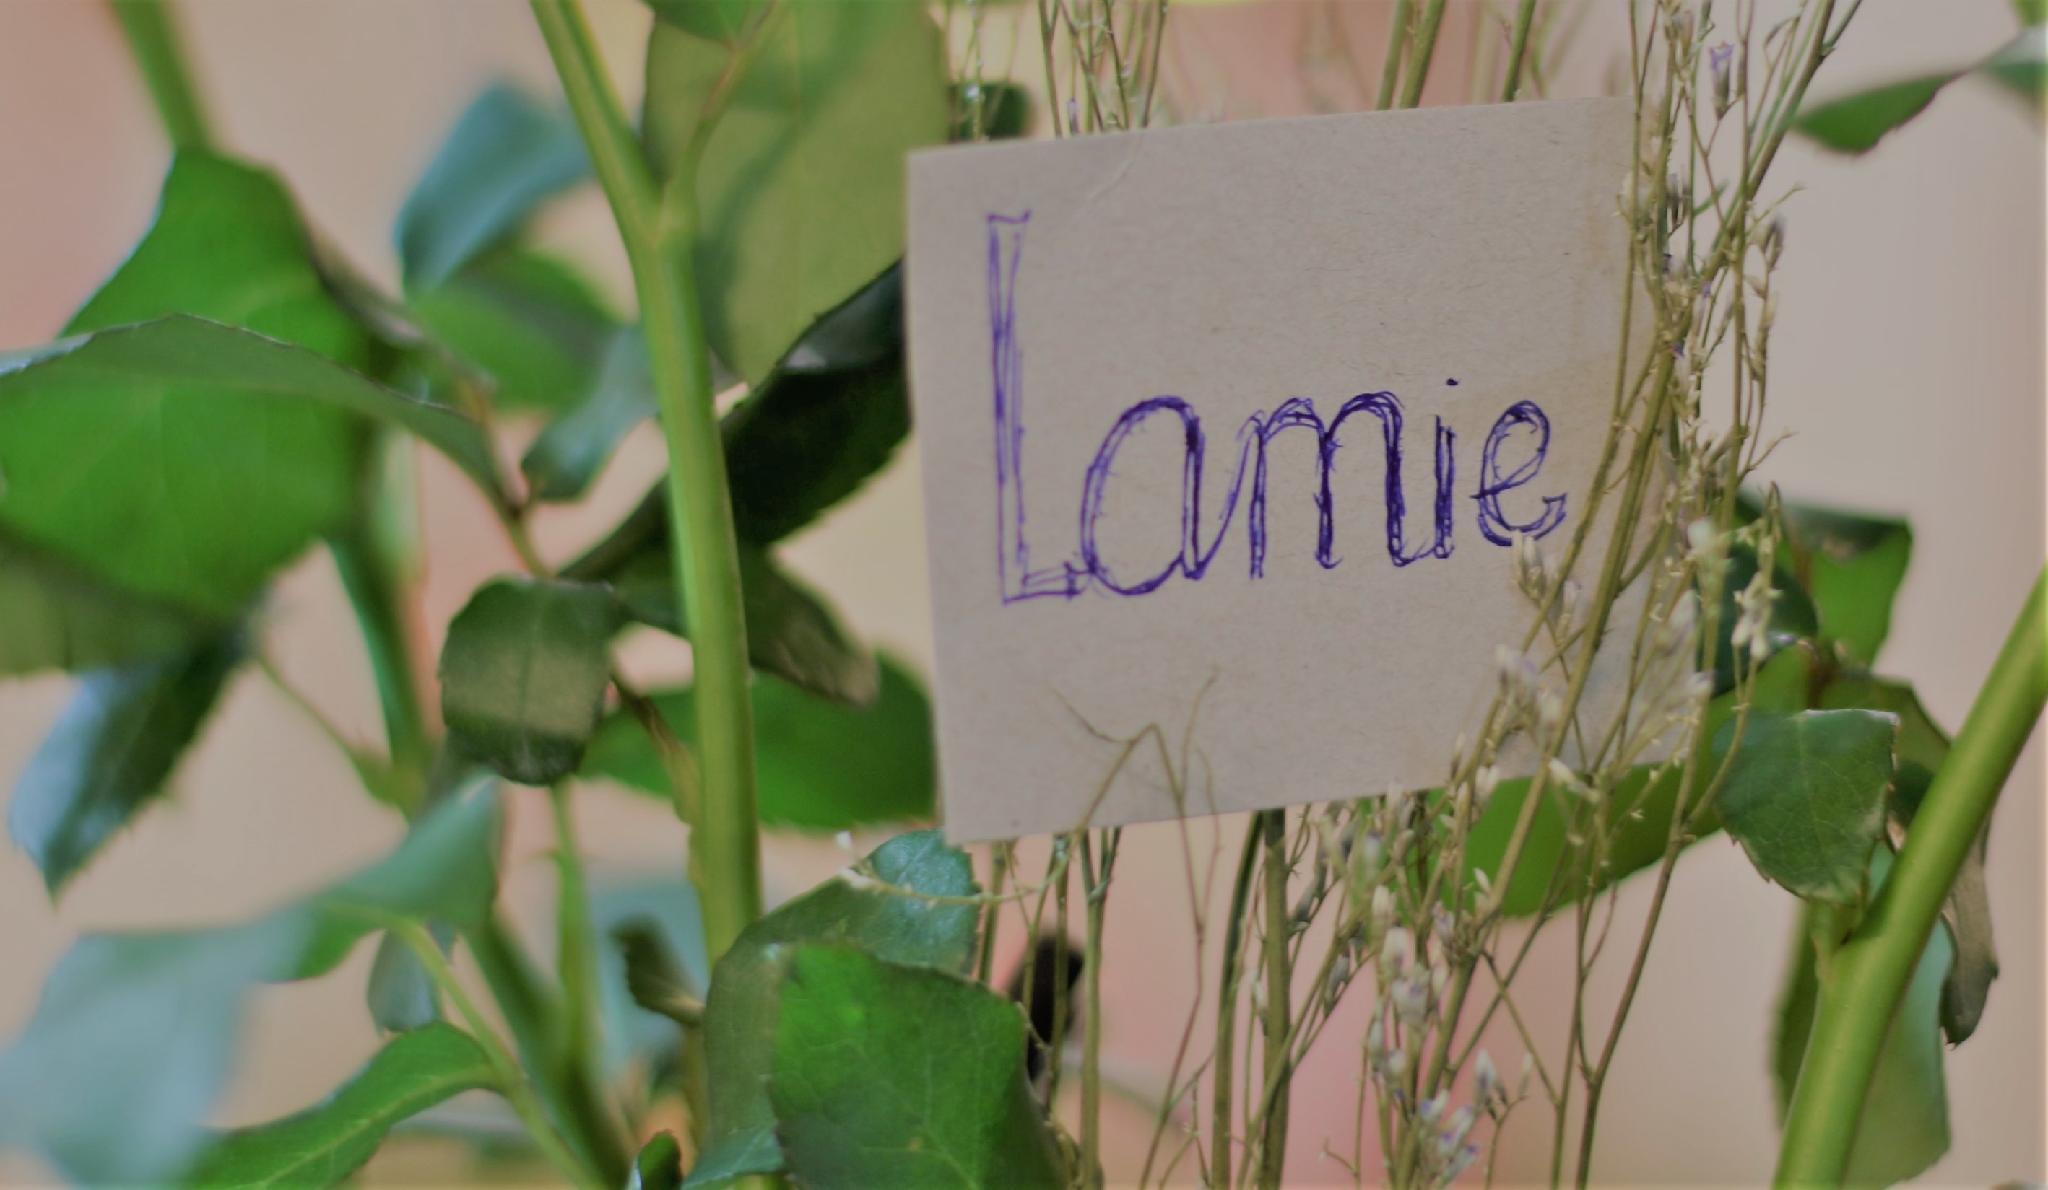 Lamie House